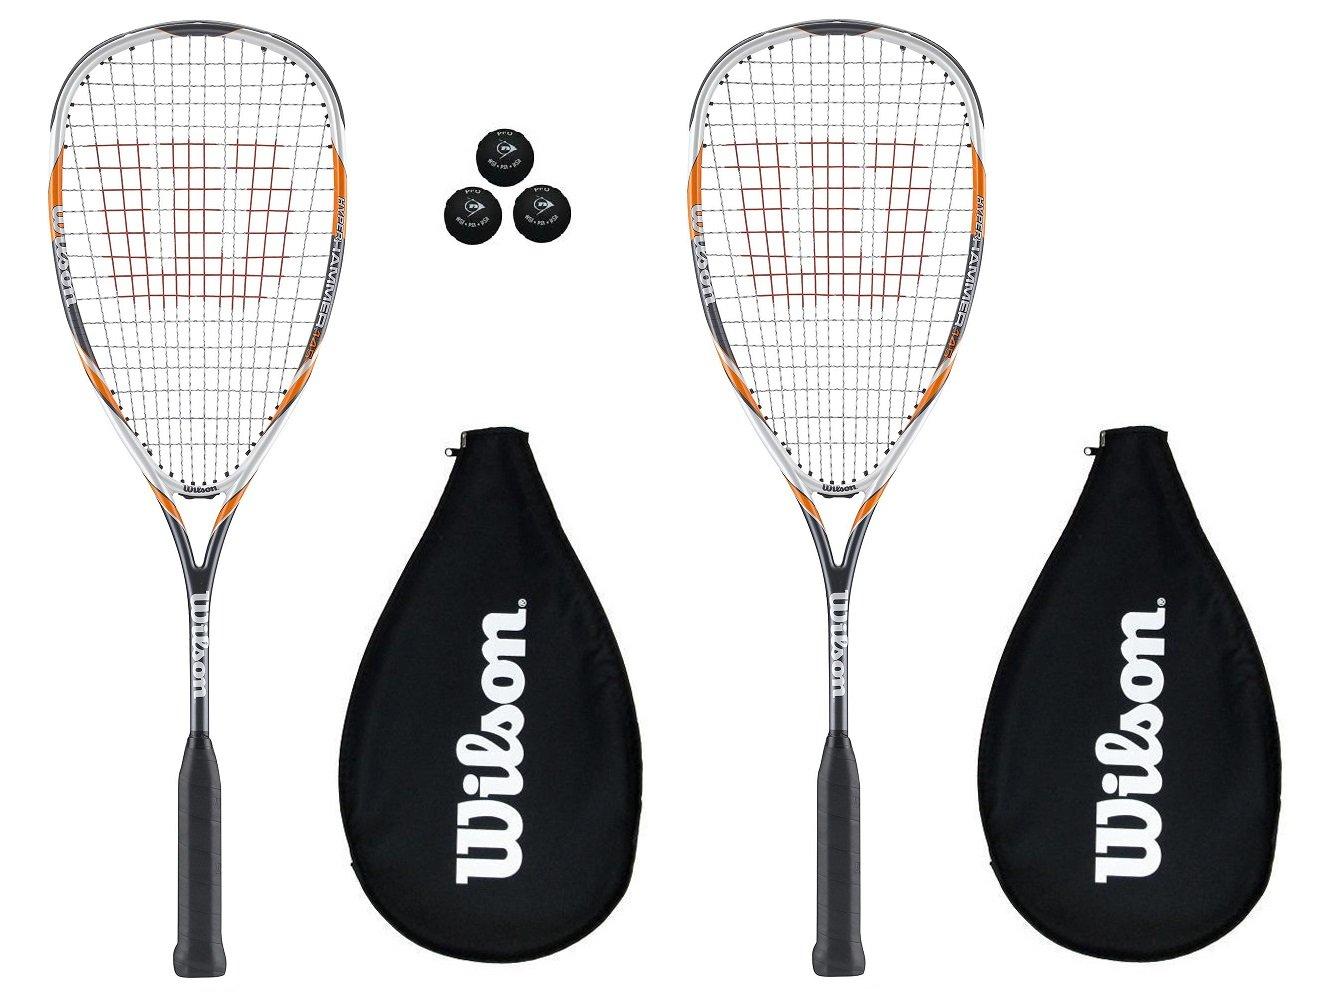 2 x Wilson Hyper Hammer 145 Yellow Squash Rackets + 3 Squash Balls